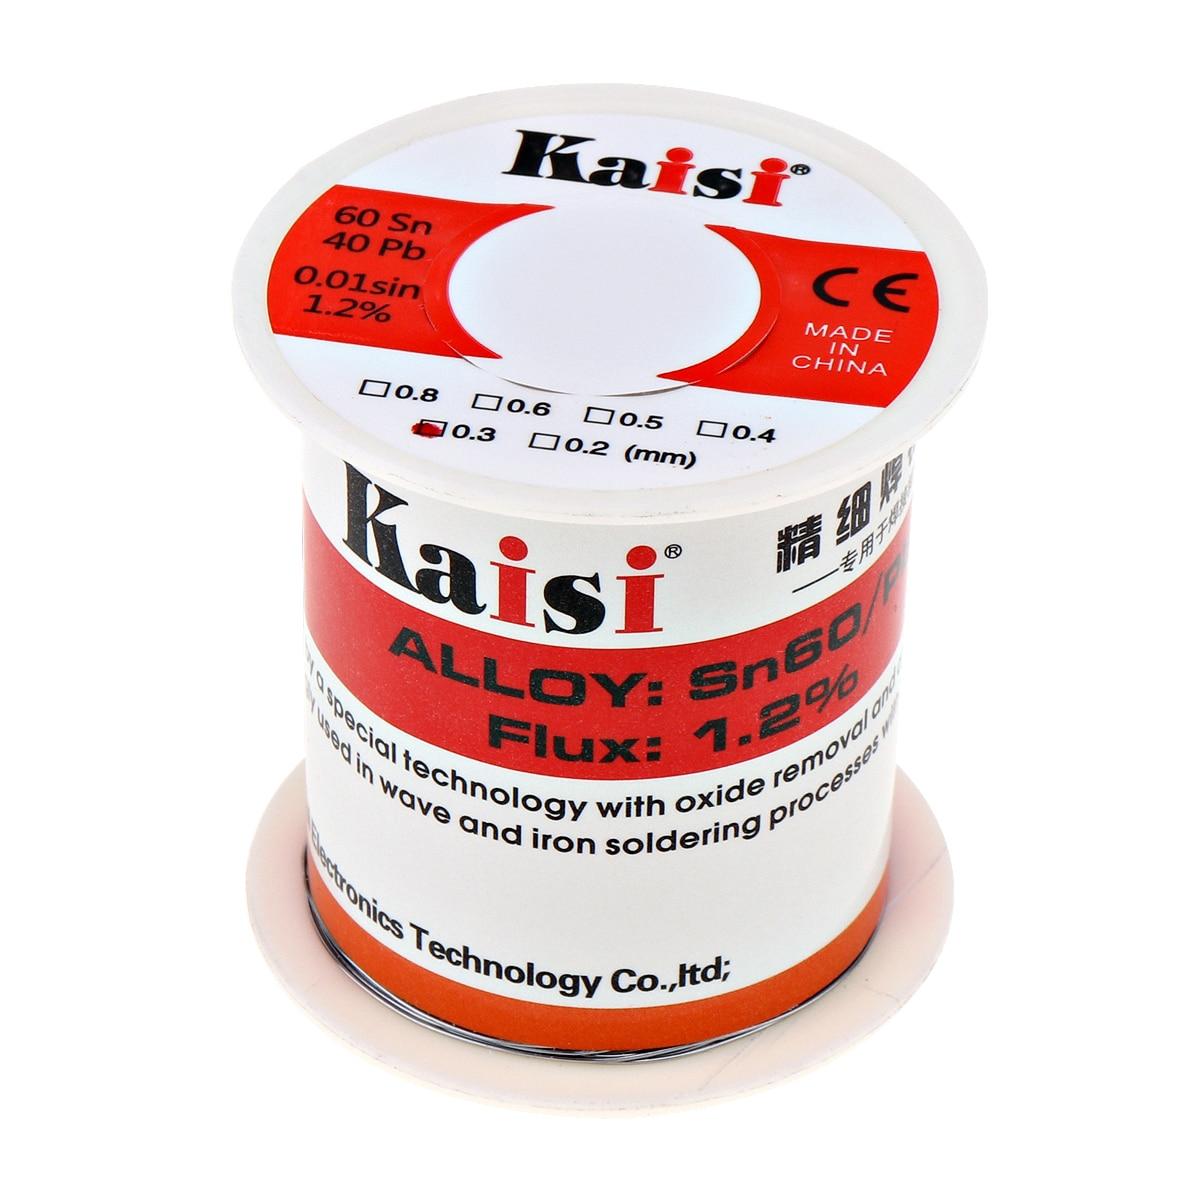 Kaisi 150g Flux 1.2% Rosin Core Pb Solder Wire Sn60/Pb40 per la Saldatura Funziona (0.3mm/0.4mm/0.5mm/0.6mm Opzionale)